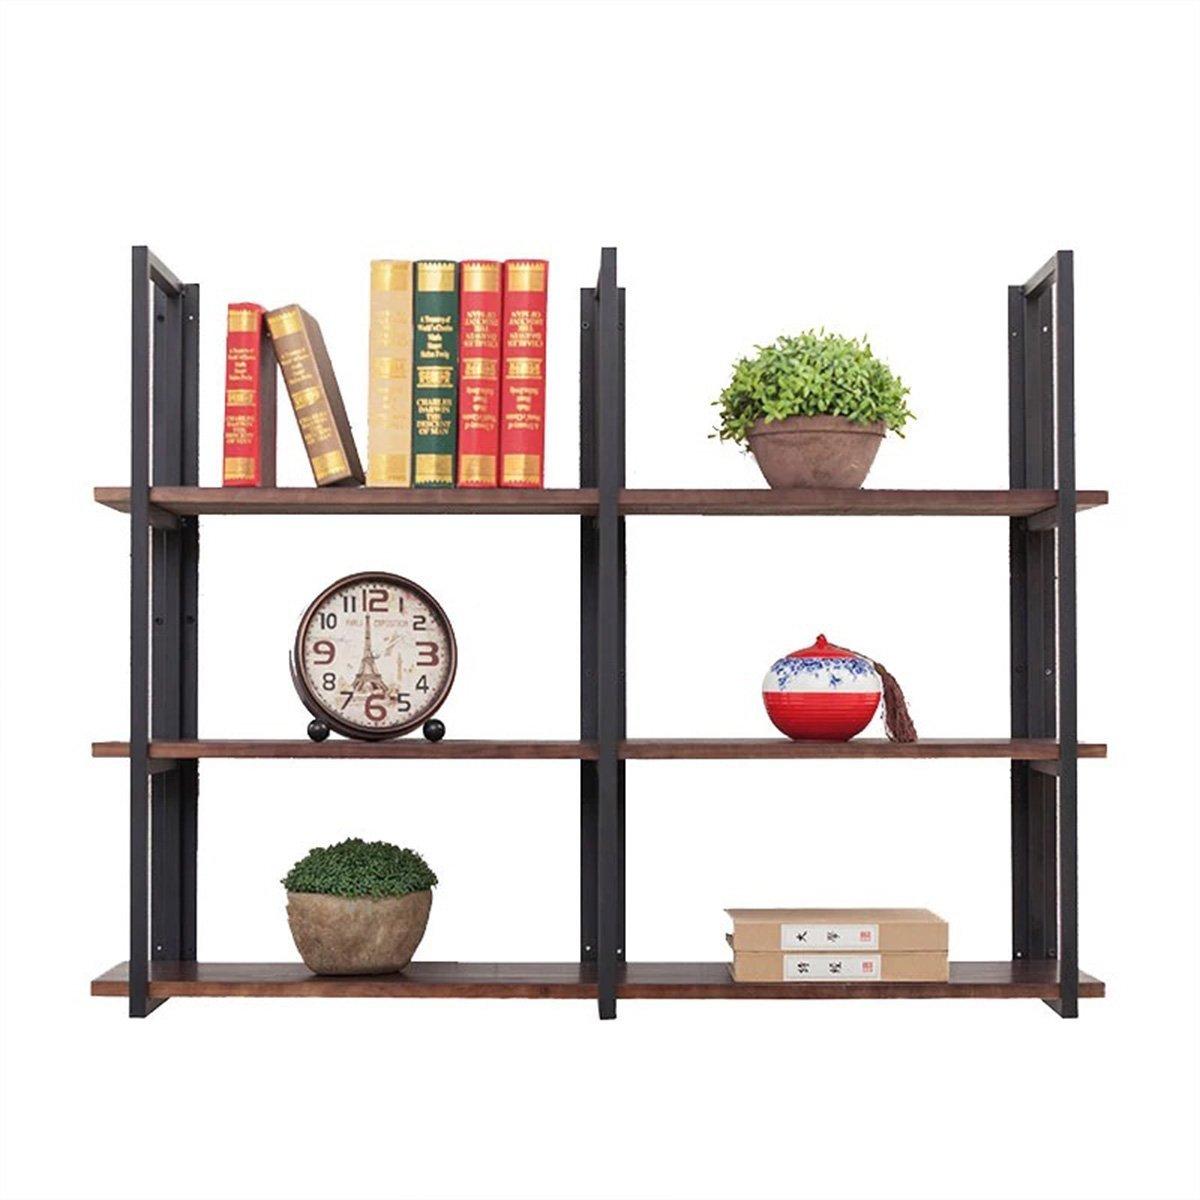 Warm Van Industrial Vintage 36 In Wood&Iron Floating Storage Shelves,Hanging Shelf, Wall Mounted Bookcase,Living Room Bedroom DIY Wall Rack